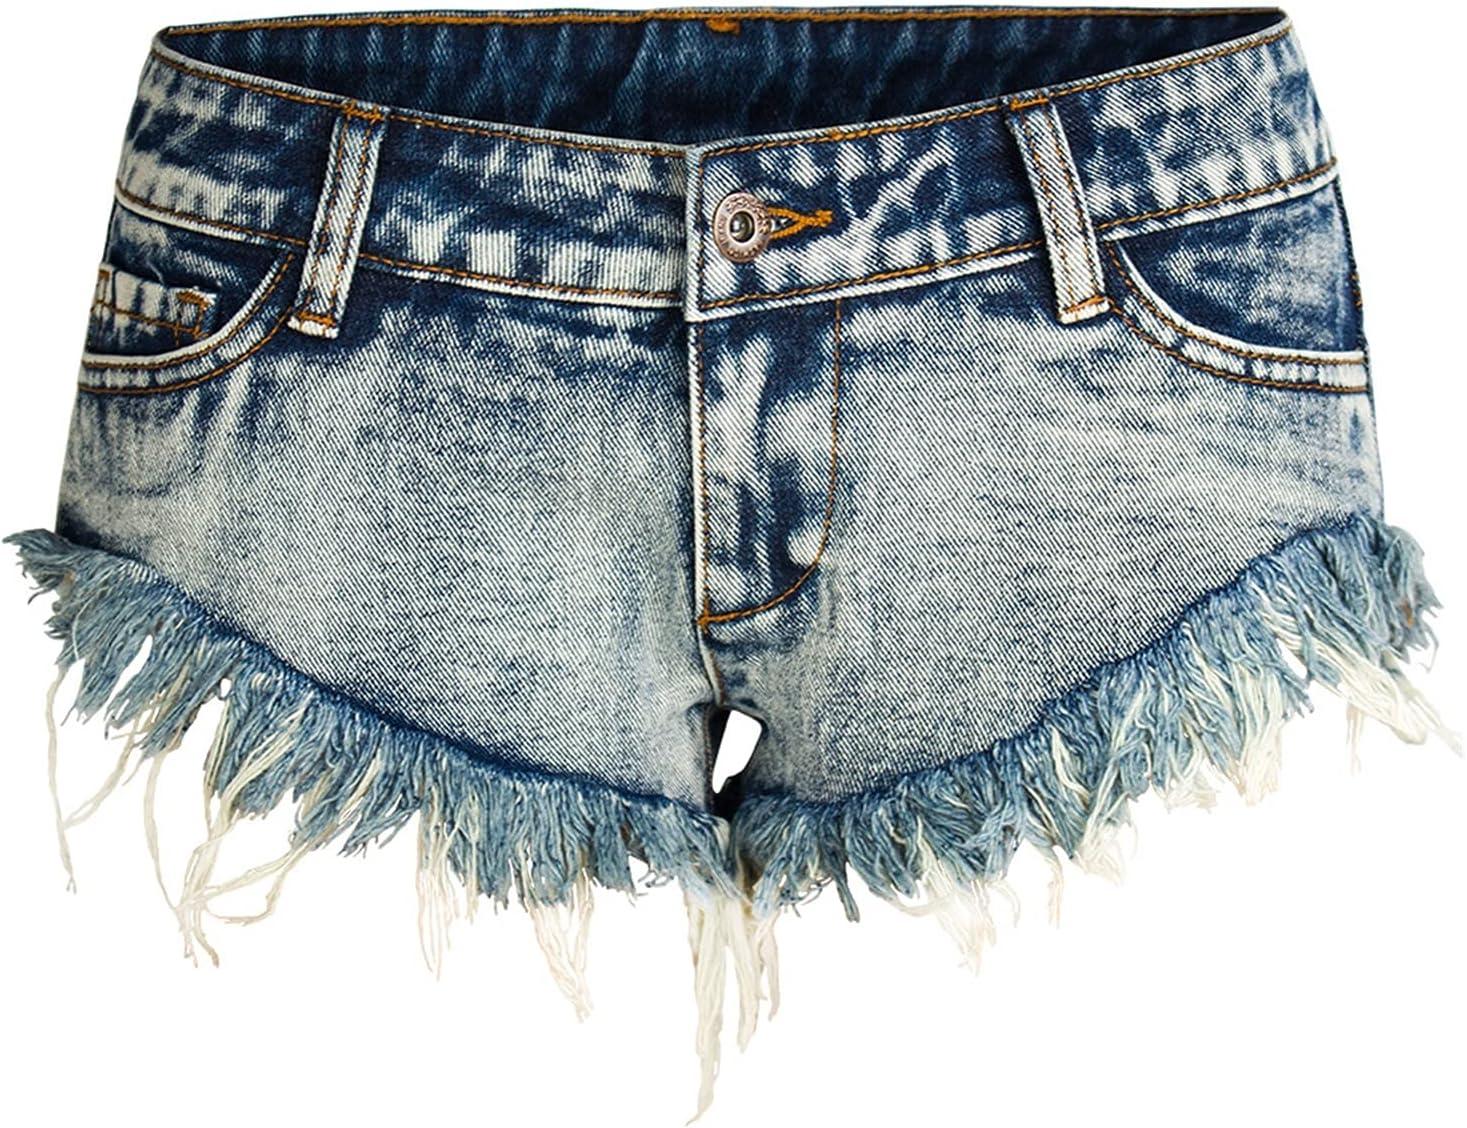 SBCDY Women's Destroyed Ripped Hole Denim Shorts Sexy Short Jeans Summer High Waist Denim Shorts Hole Tear Tassel Denim Shorts (Color : Blue, Size : 44)